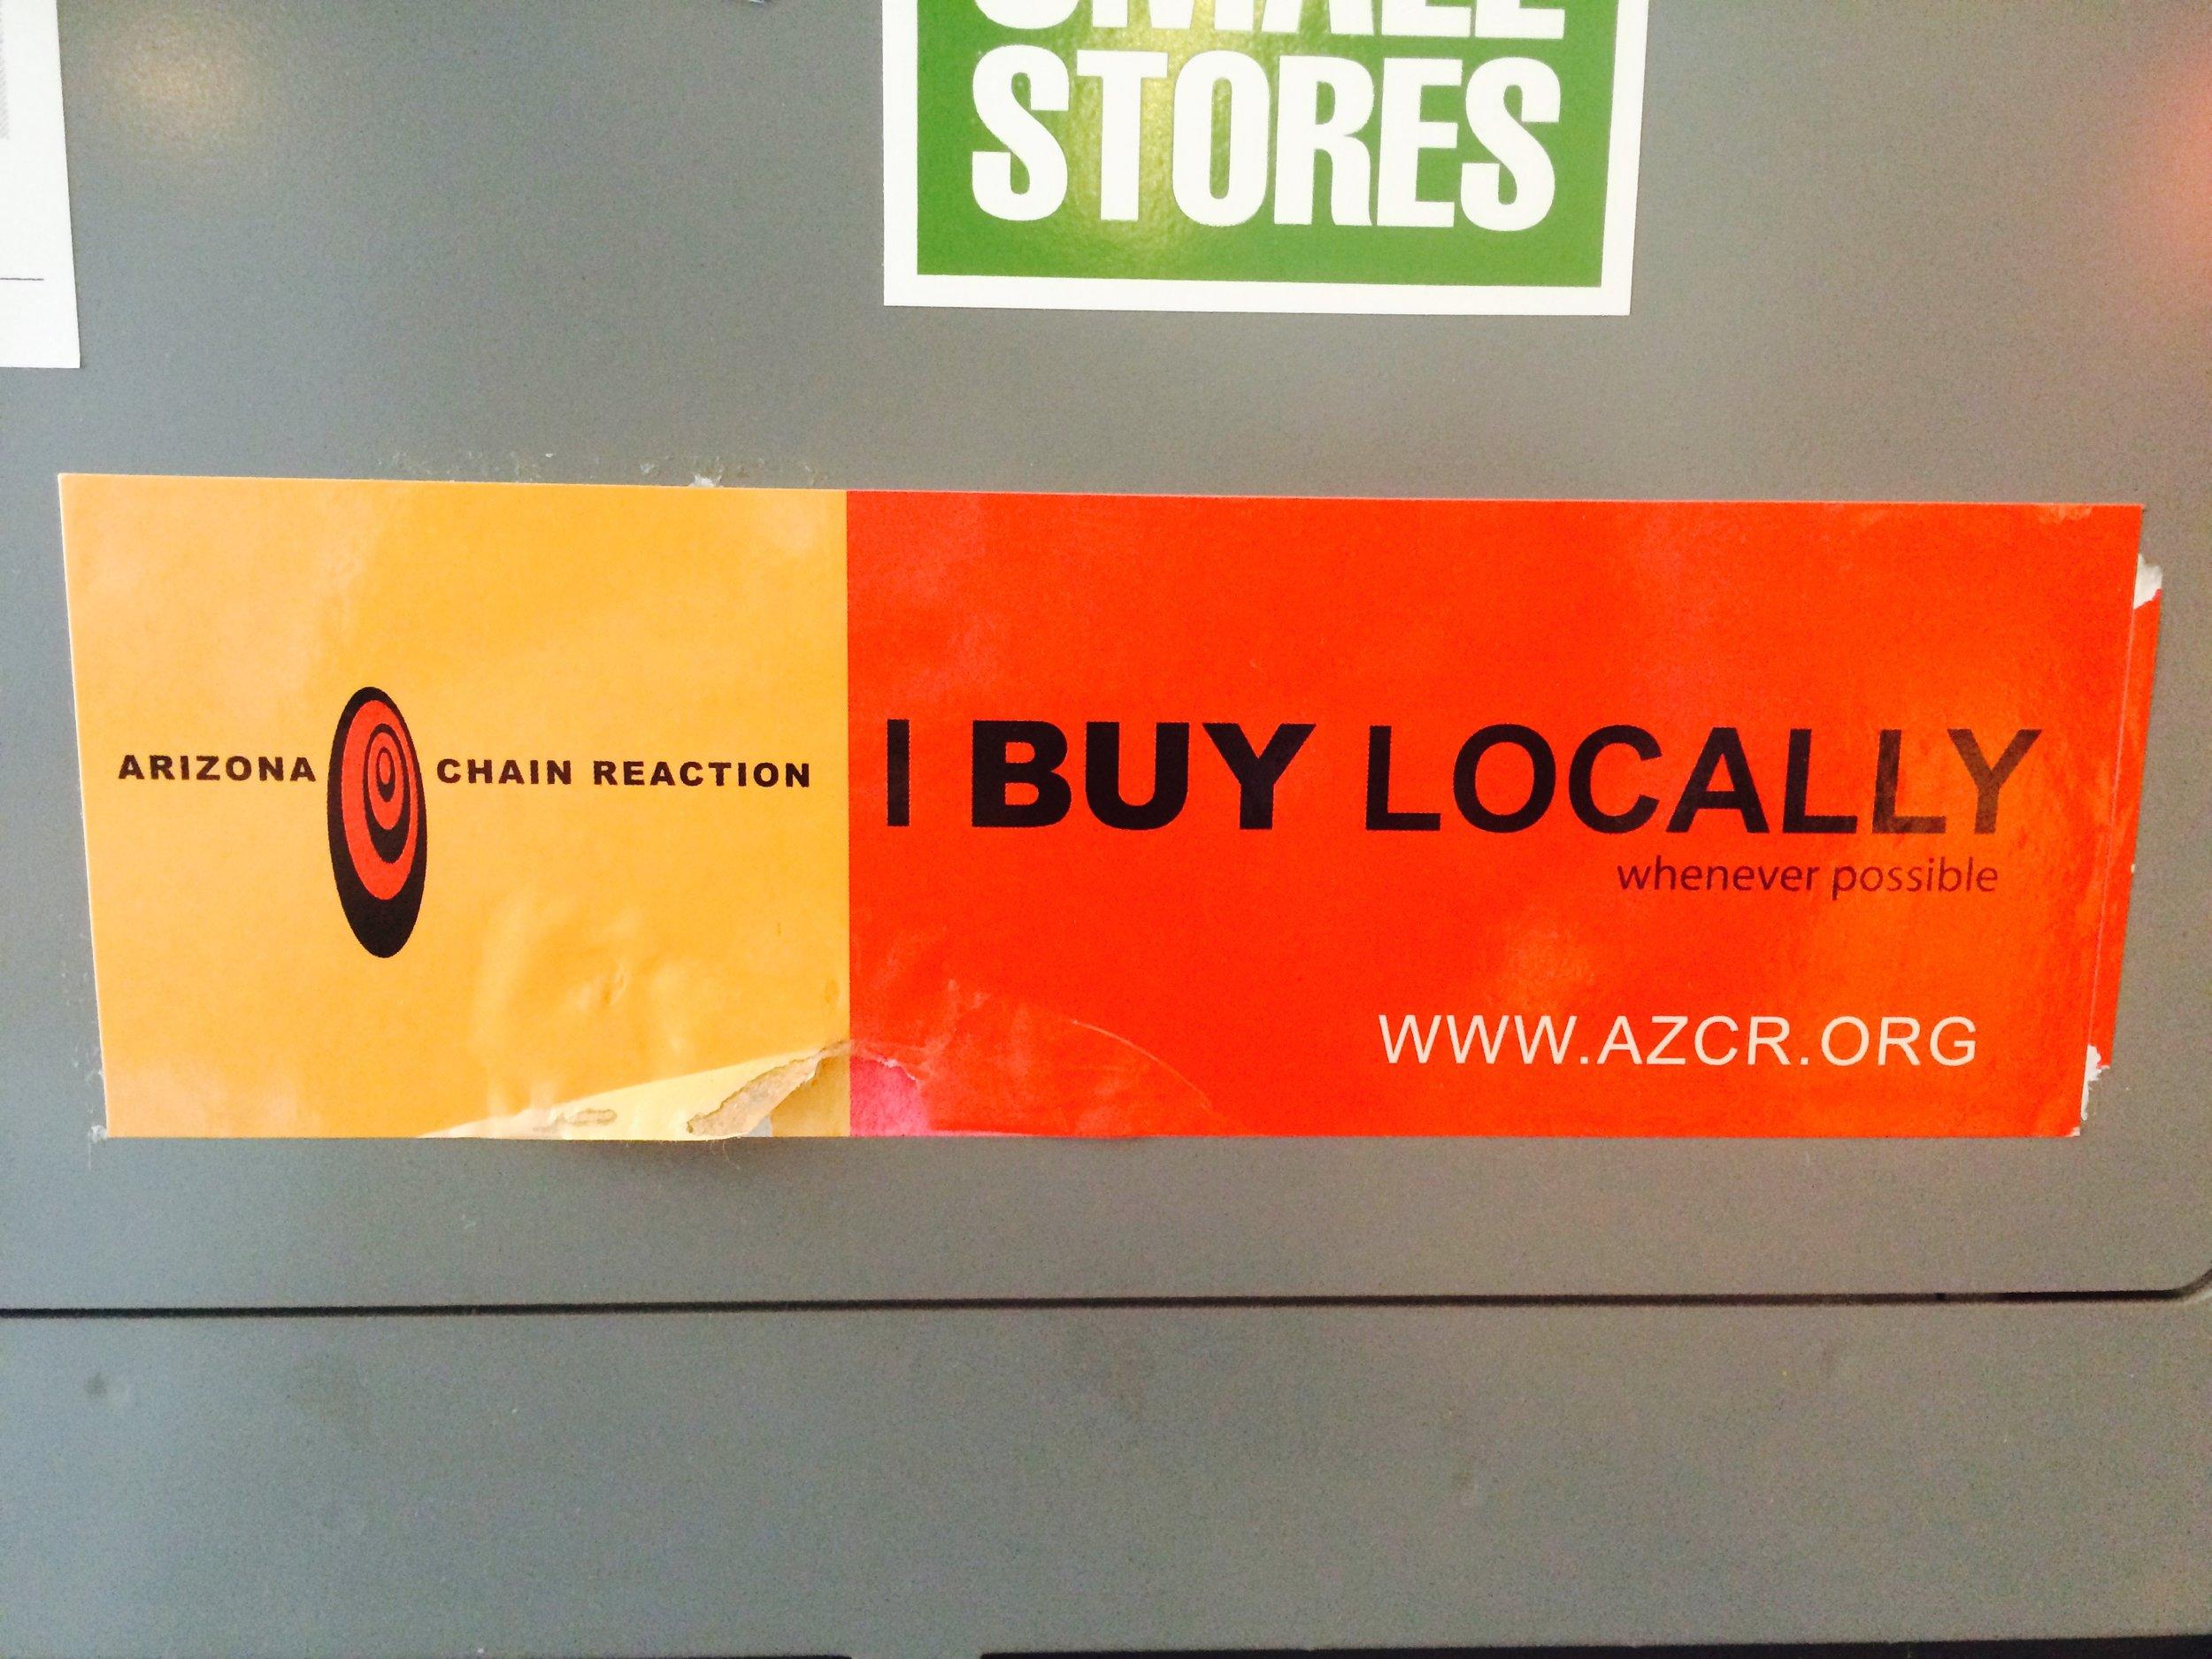 2003: Kimber Lanning launches Local First Arizona (originally as Arizona Chain Reaction)